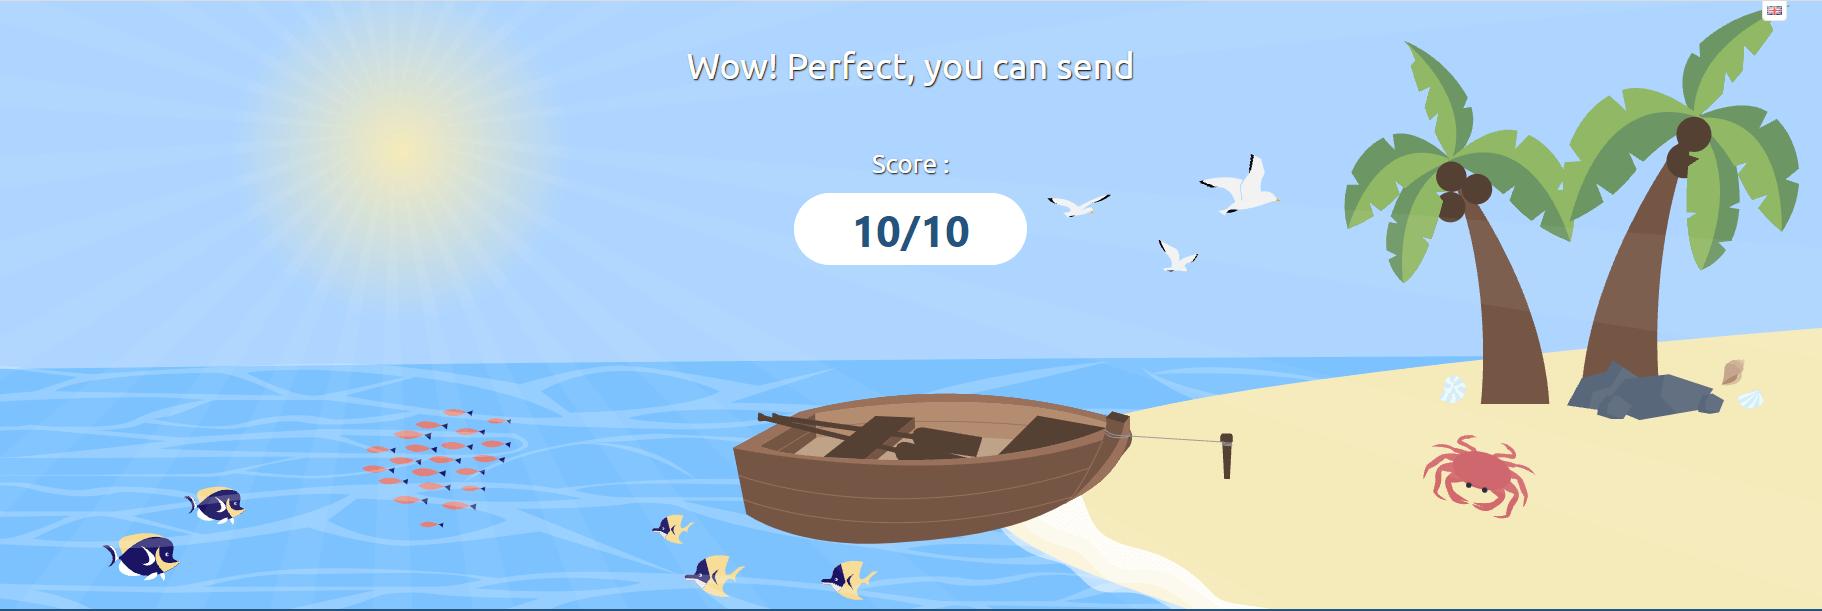 Výsledek testu spam skóre